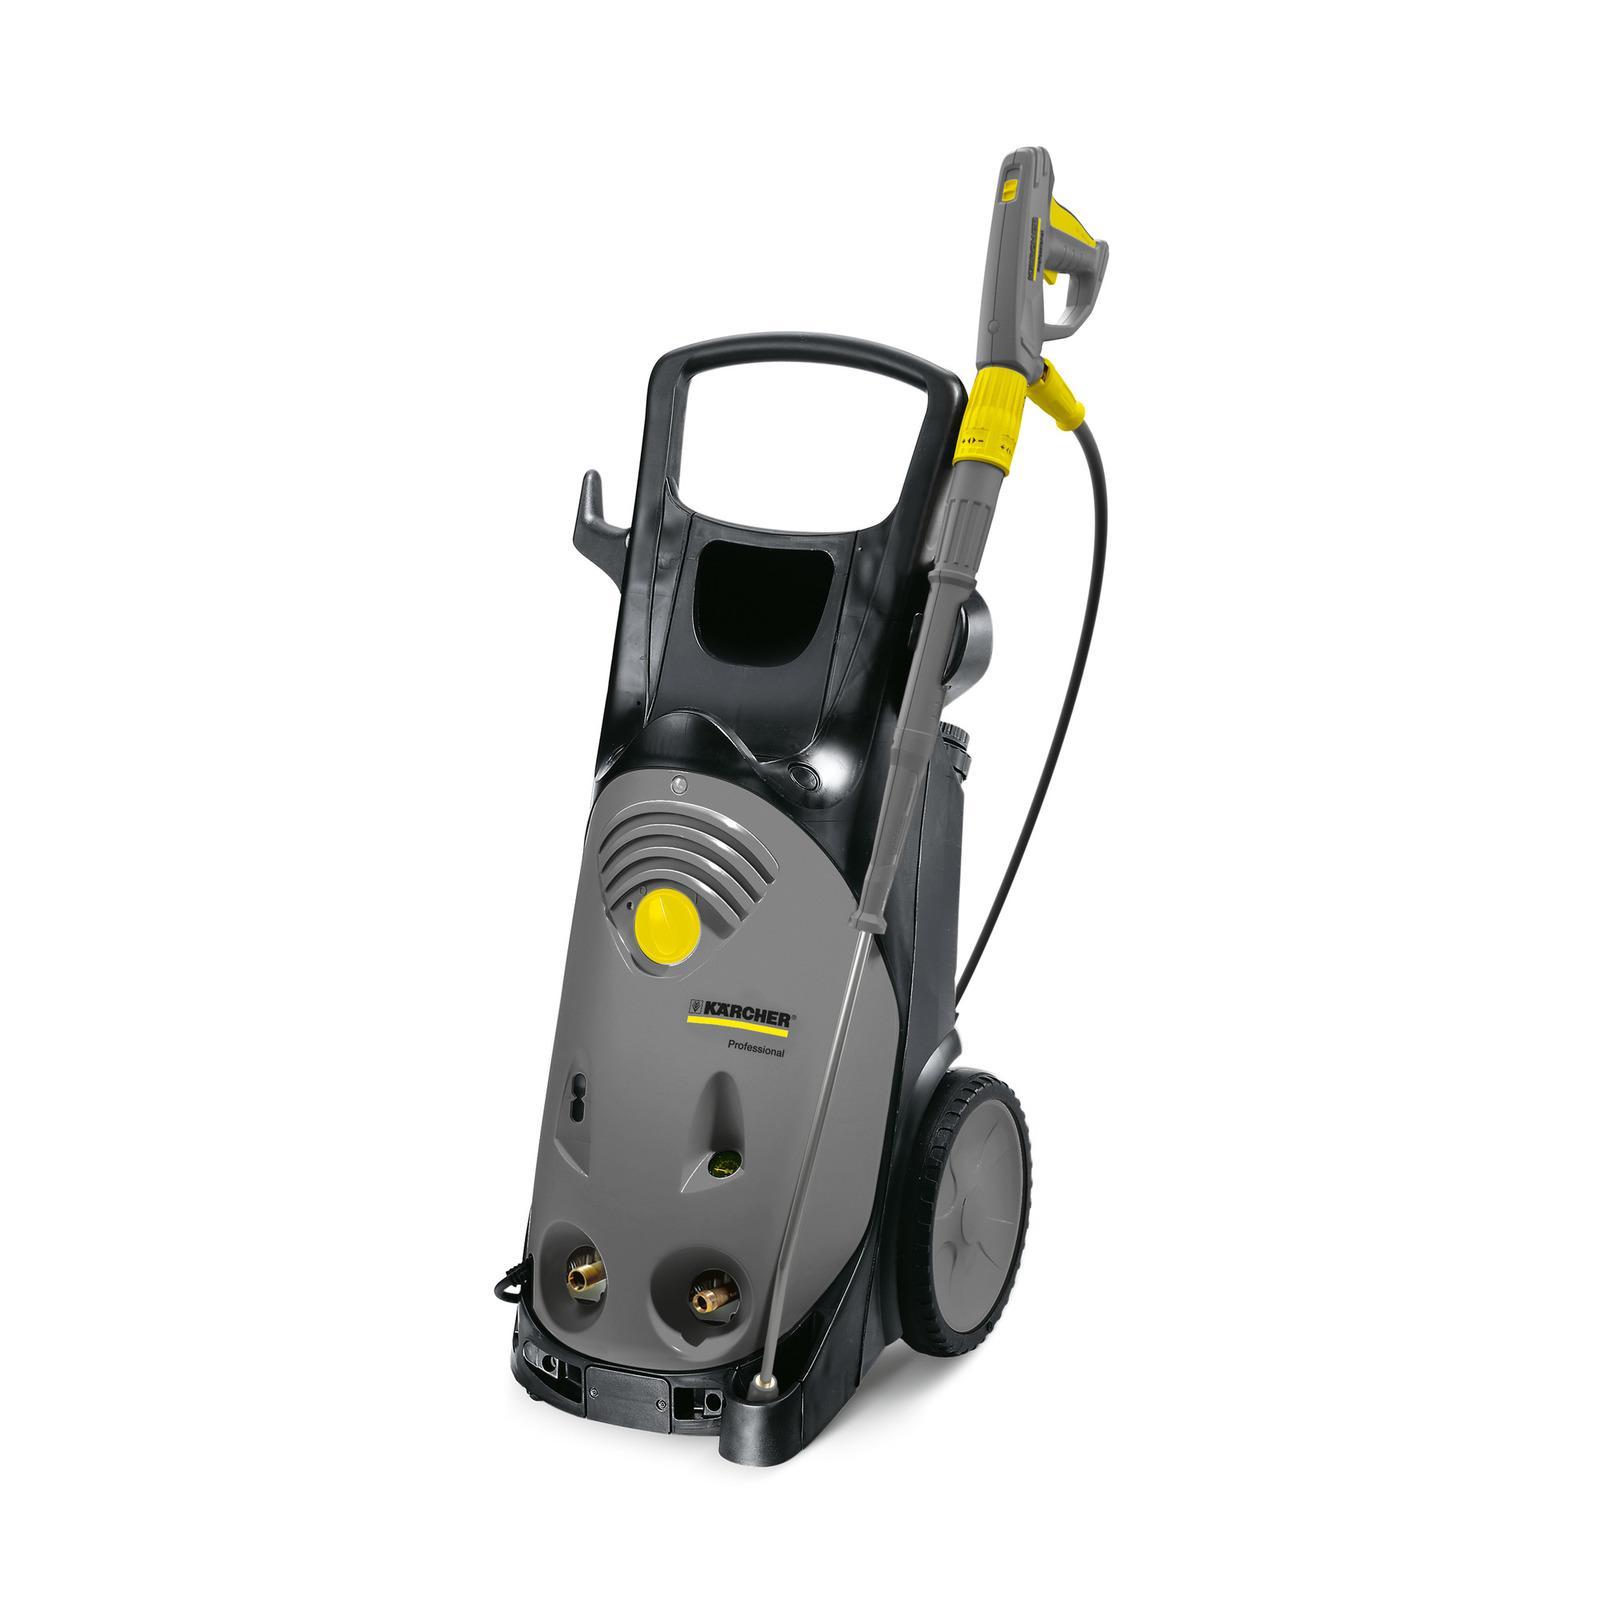 Koudwater hogedrukreiniger HD 17/14-4 S Plus